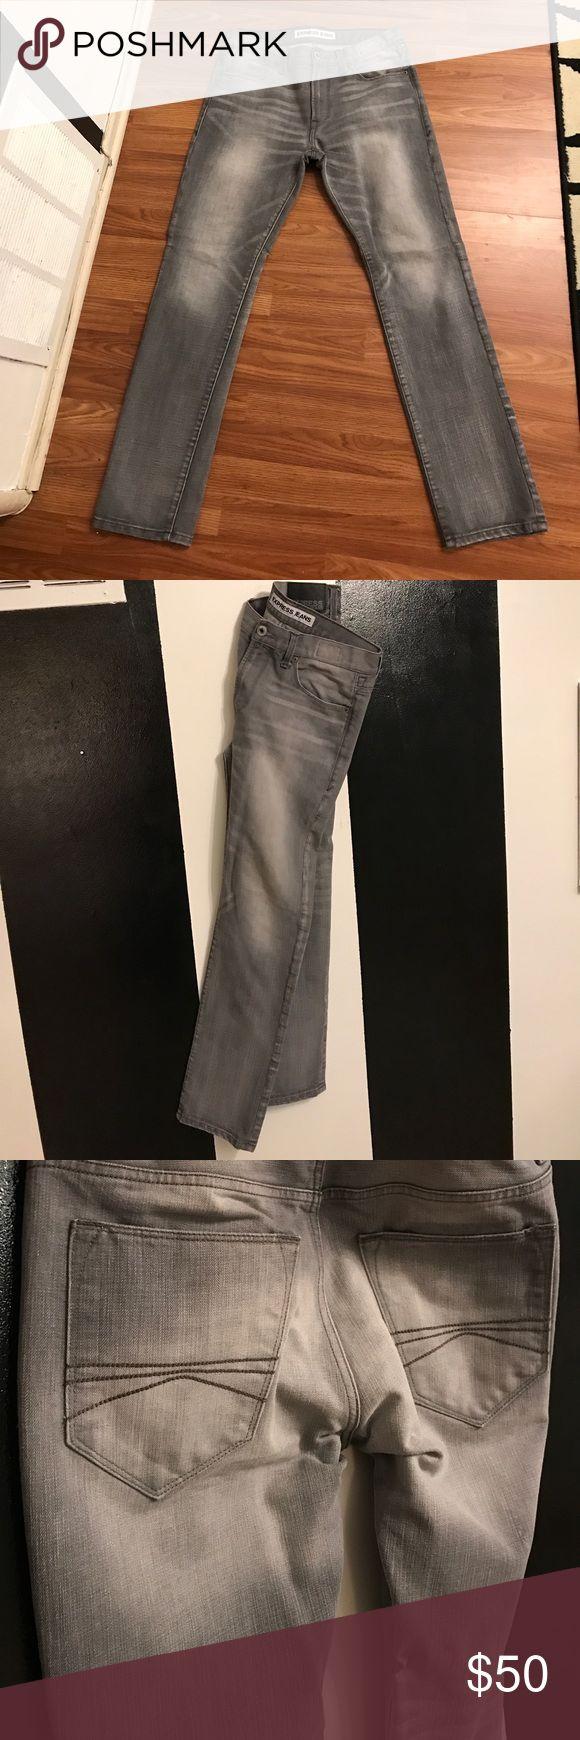 Express men's jeans Closet close out !!!!!Express men's distressed jeans. 32x32 Express Jeans Slim